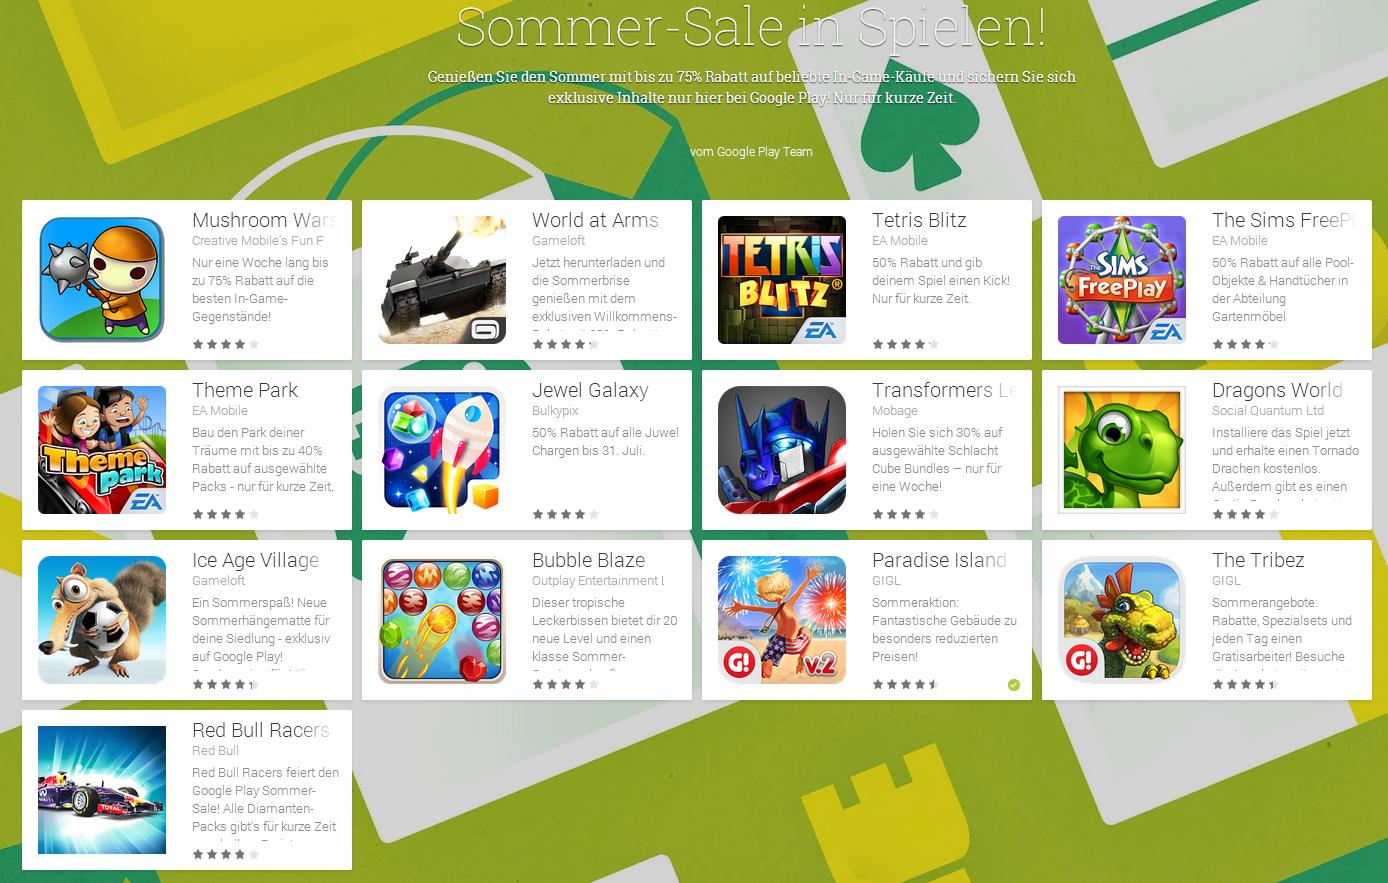 Sumer-Sale_Spiele_in-app.png